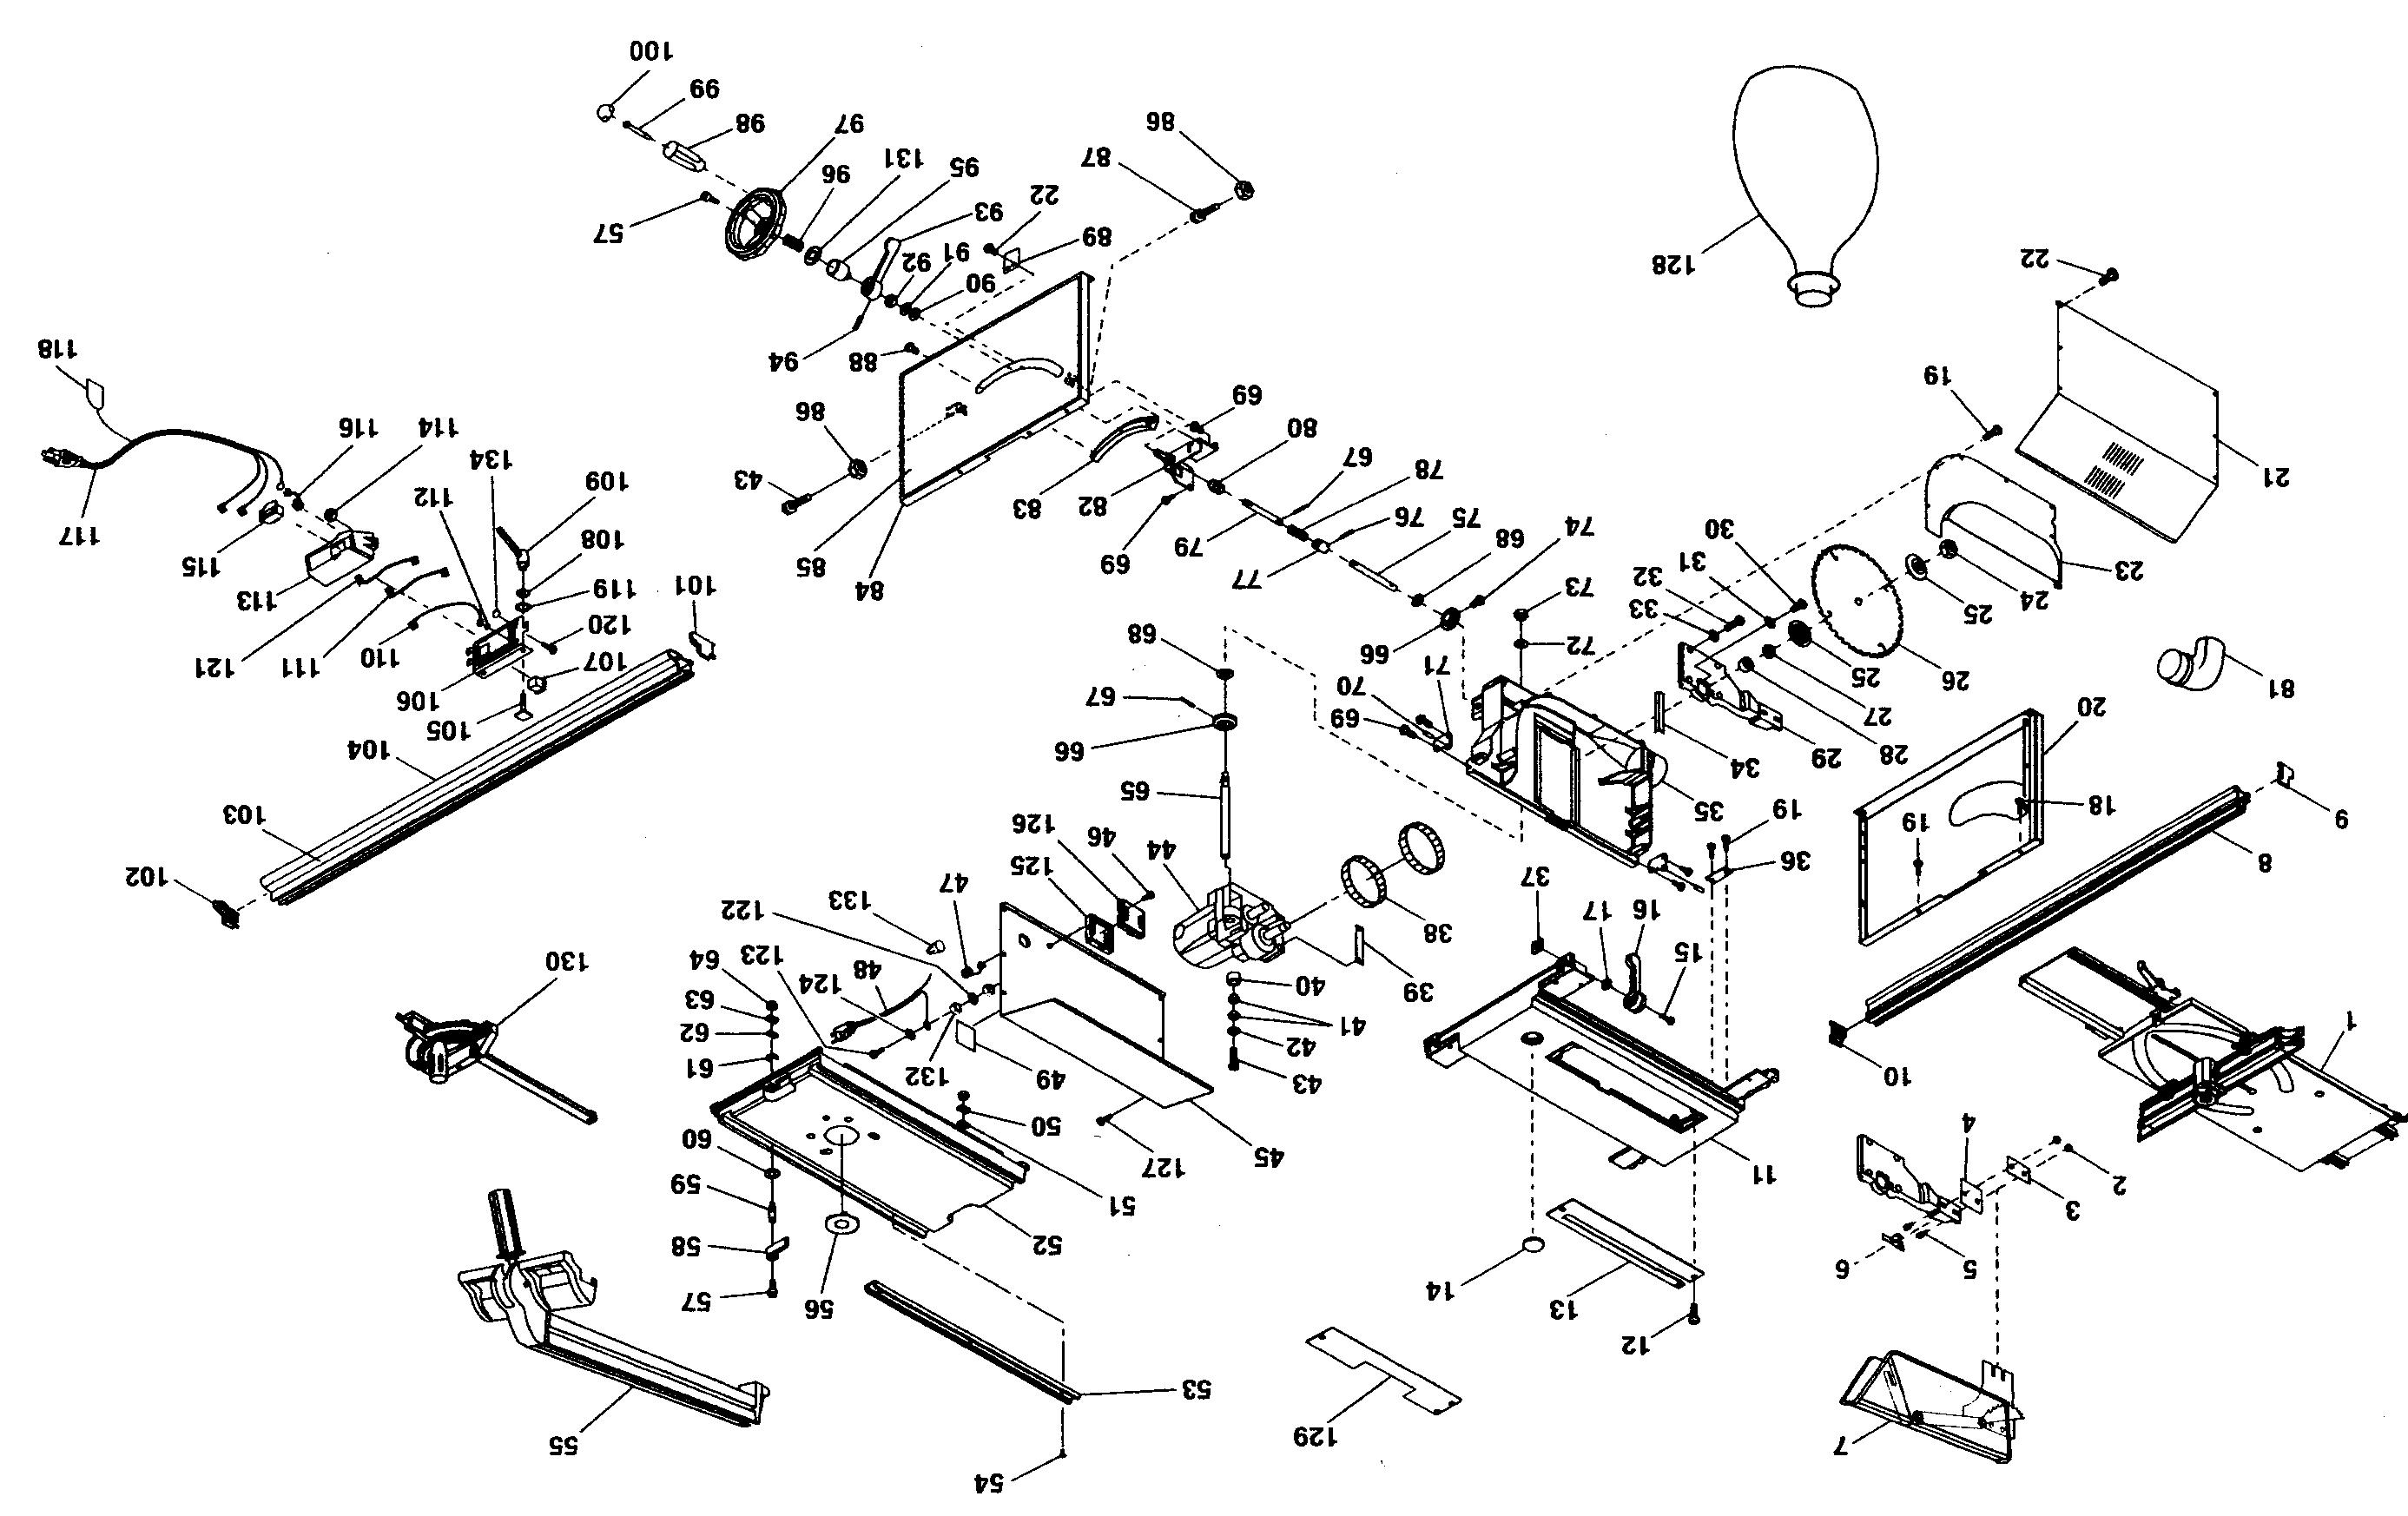 Craftsman model 315274130 table saw genuine parts